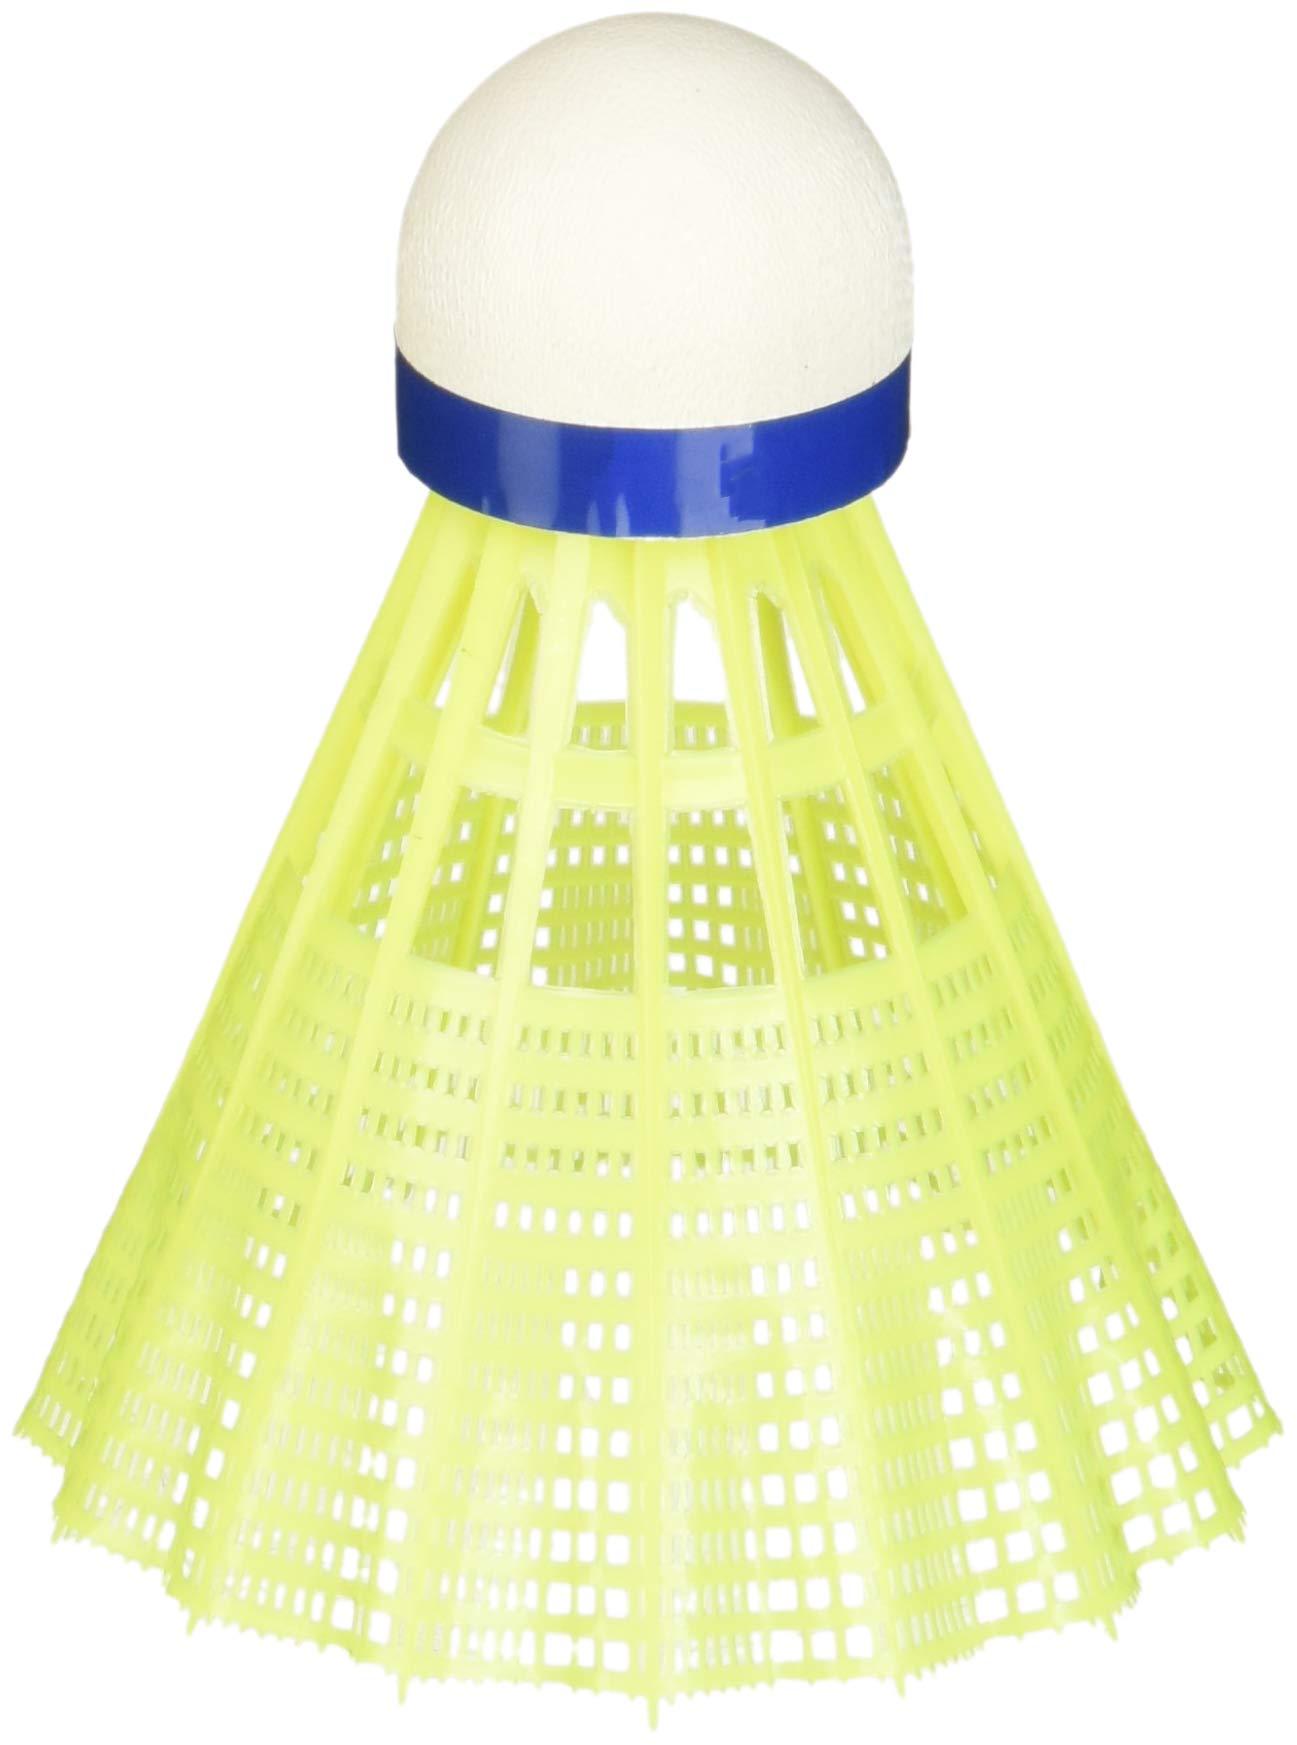 Yonex Mavis 300 Medium Speed Nylon Plastic Shuttlecock (Yellow, Pkg of 2 tubes (12 pcs))